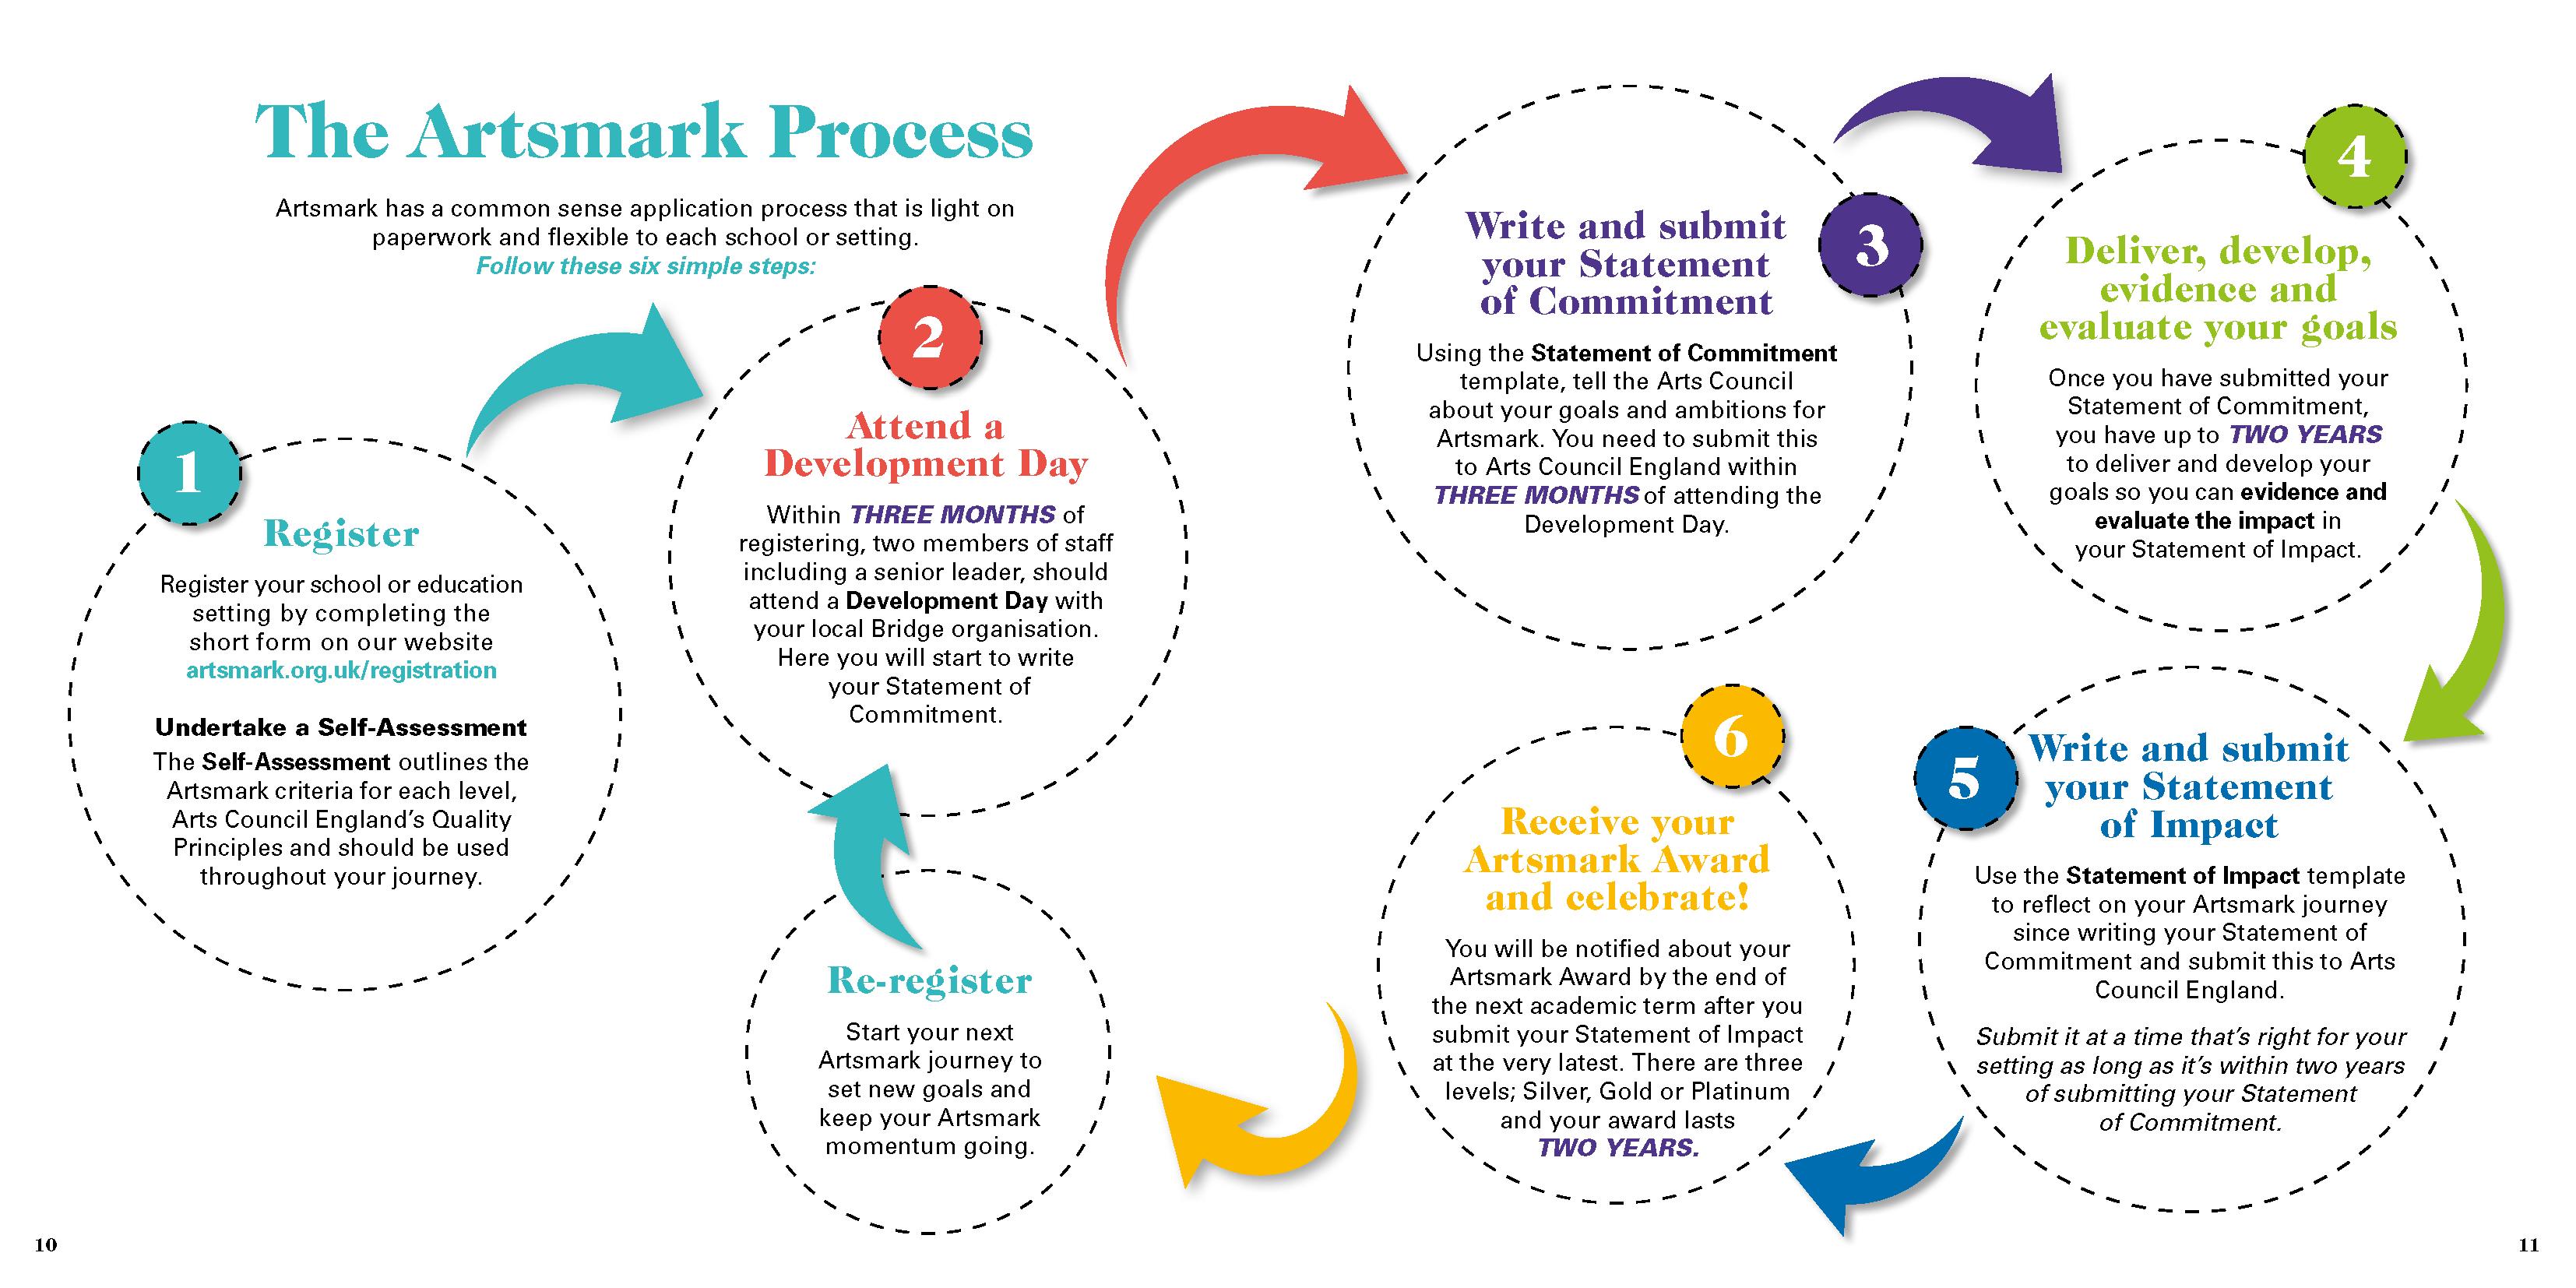 artsmark process